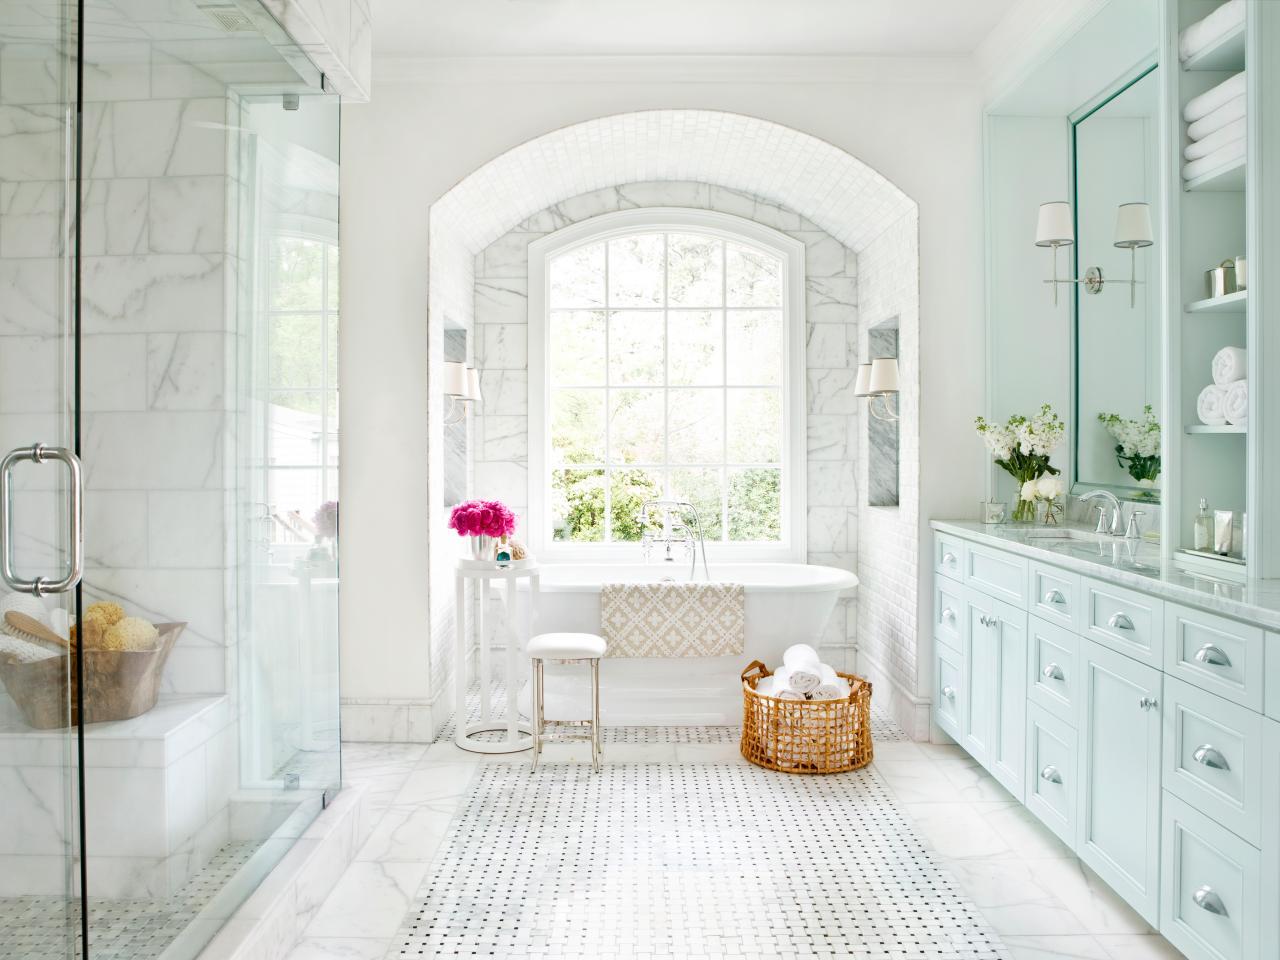 CI-mark-williams-marble-bathroom-lead-shot_s4x3.jpg.rend.hgtvcom.1280.960.jpeg